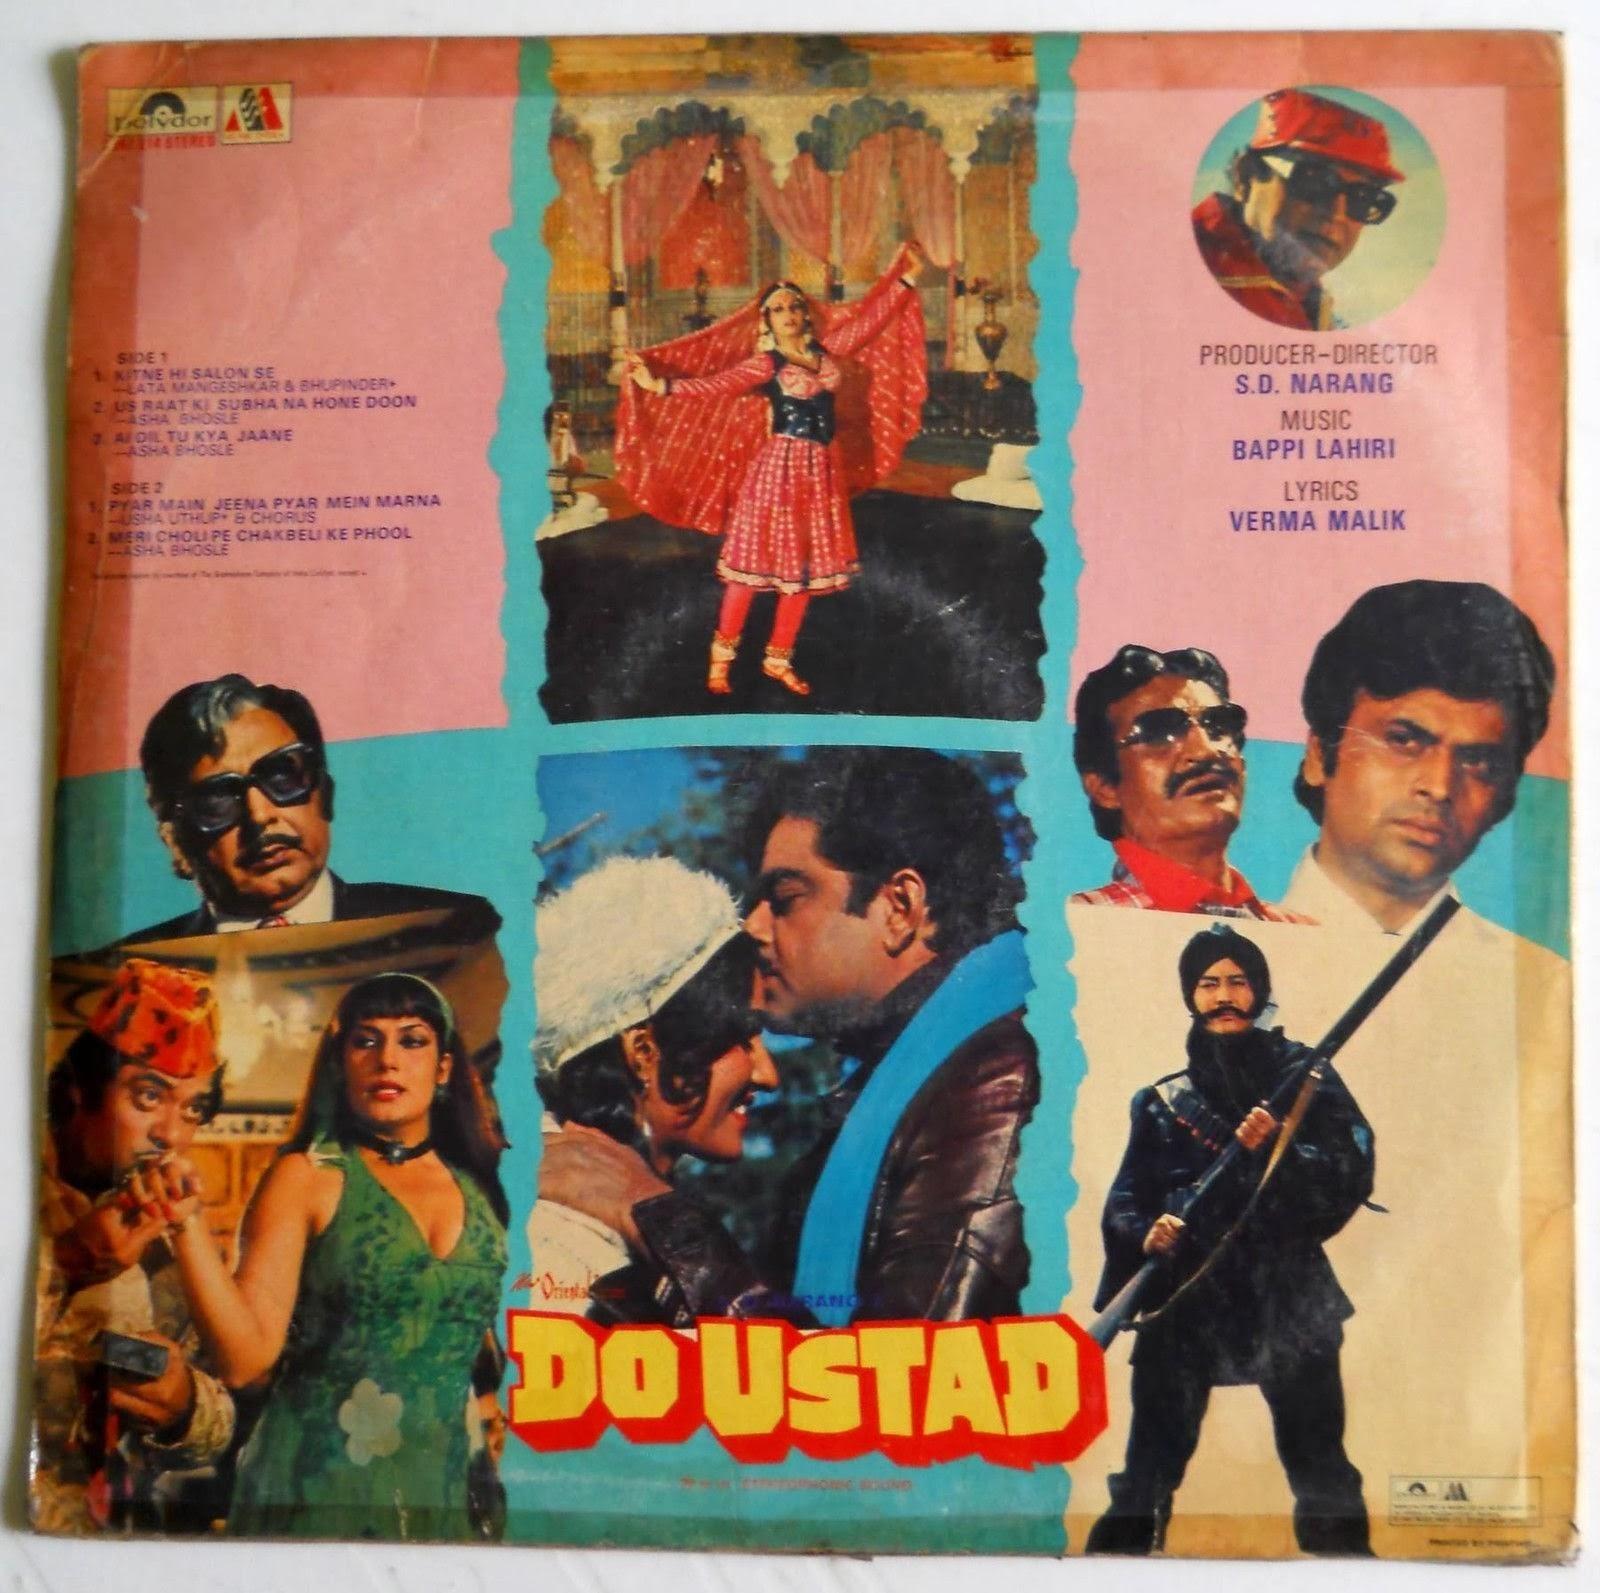 Ustad movie songs pk : Apparitional film